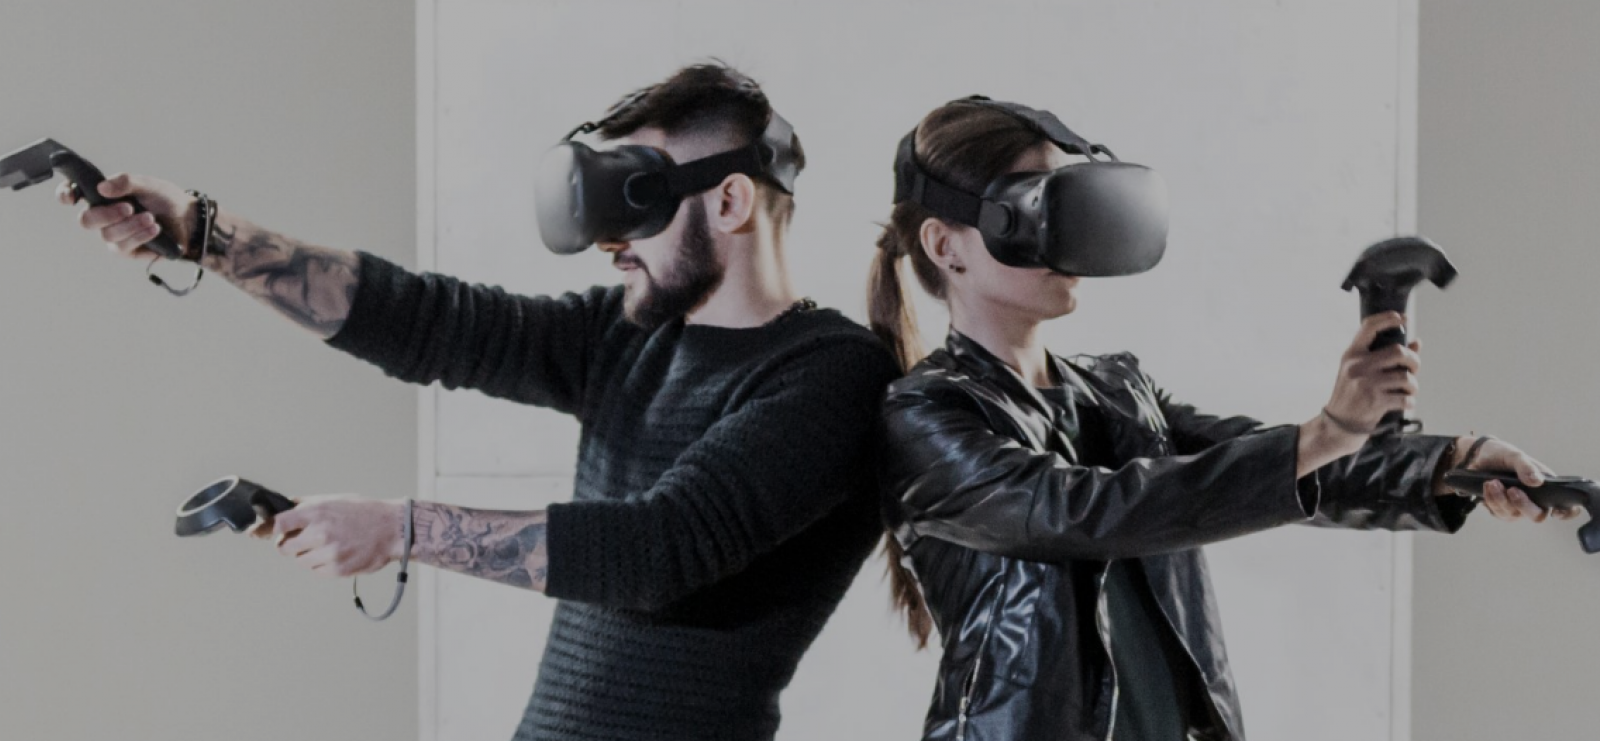 DestiVR - Virtual Reality Room